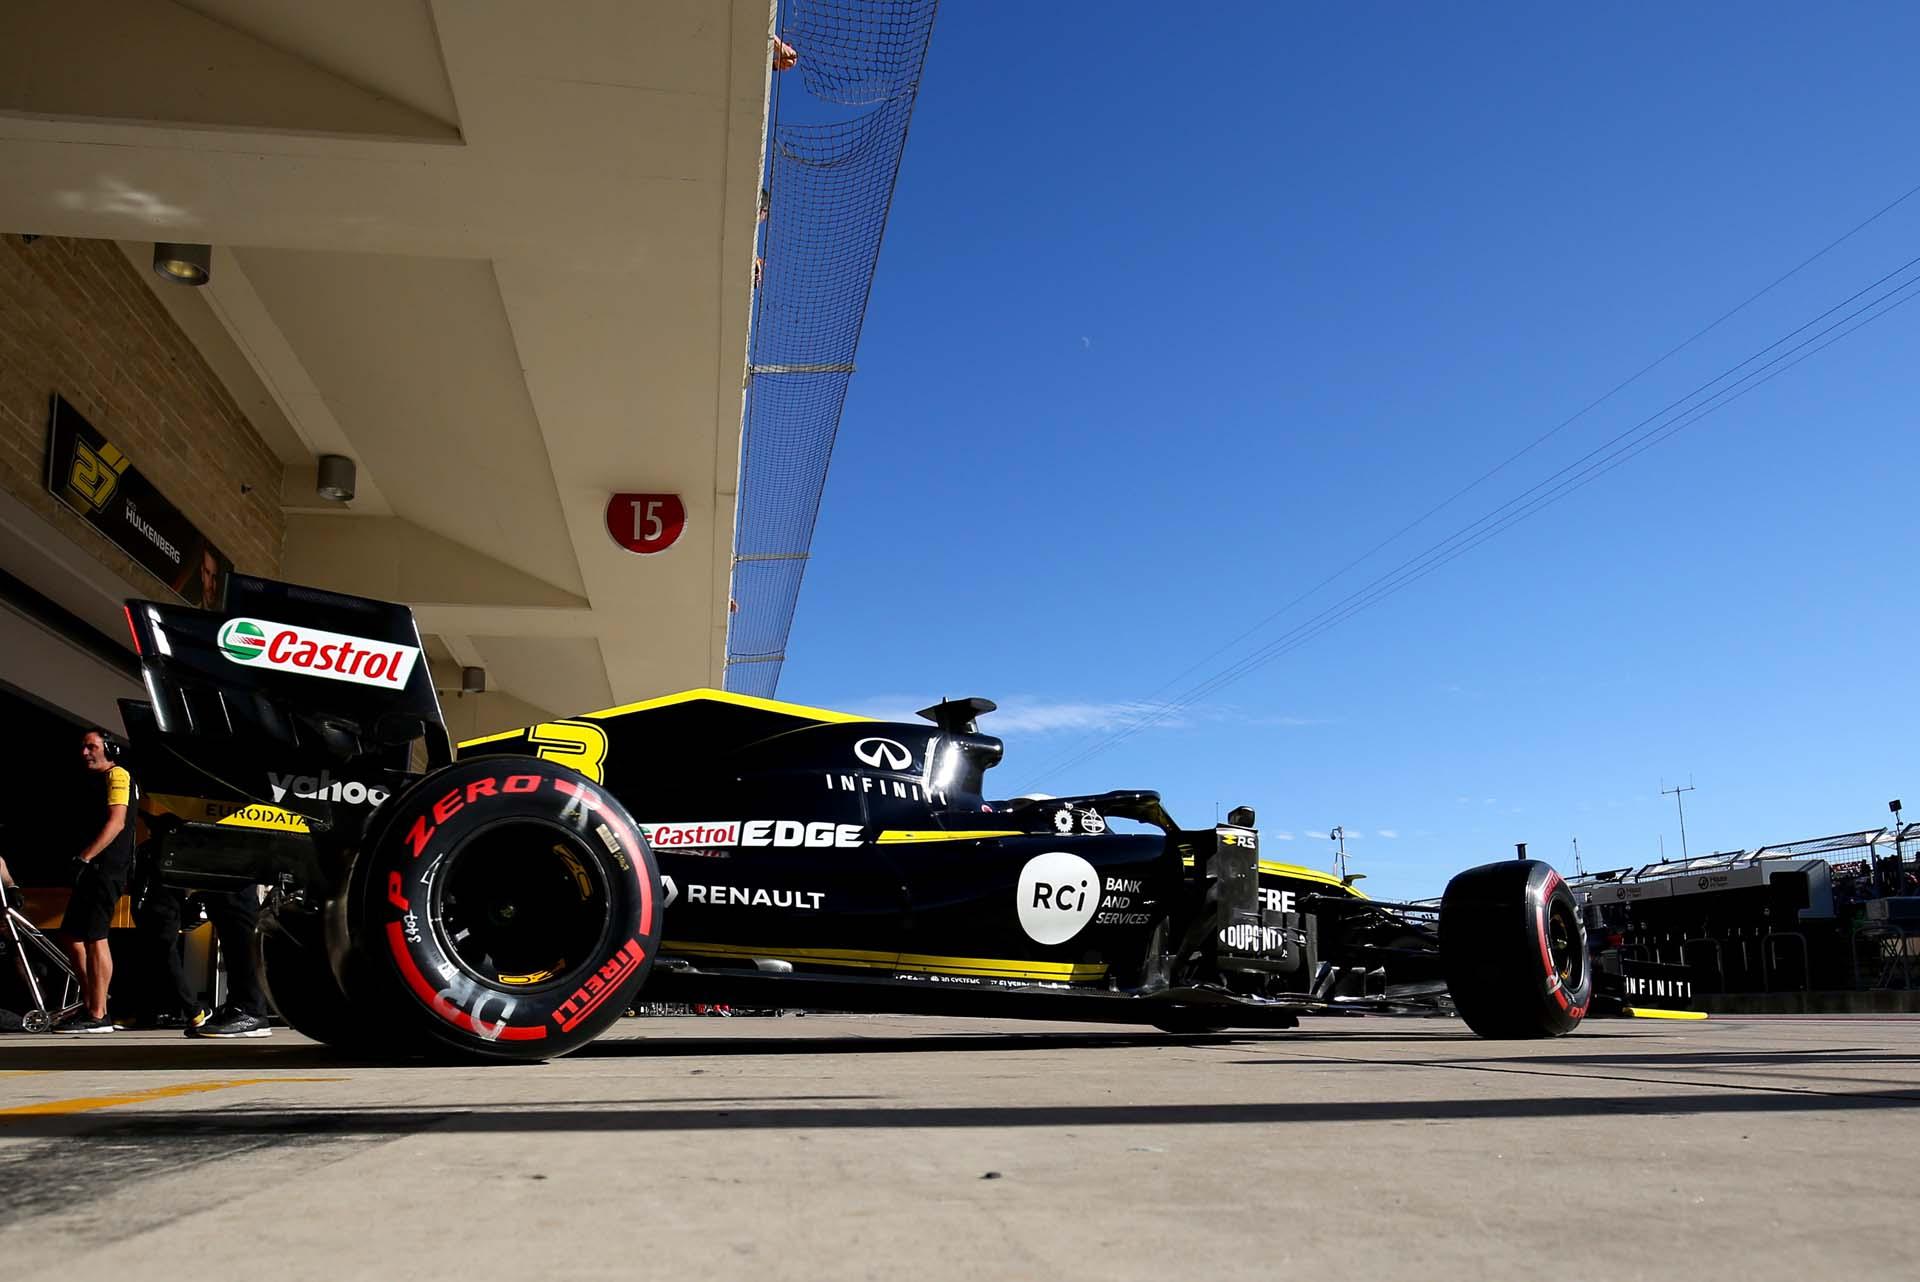 Motor Racing - Formula One World Championship - United States Grand Prix - Qualifying Day - Austin, USA